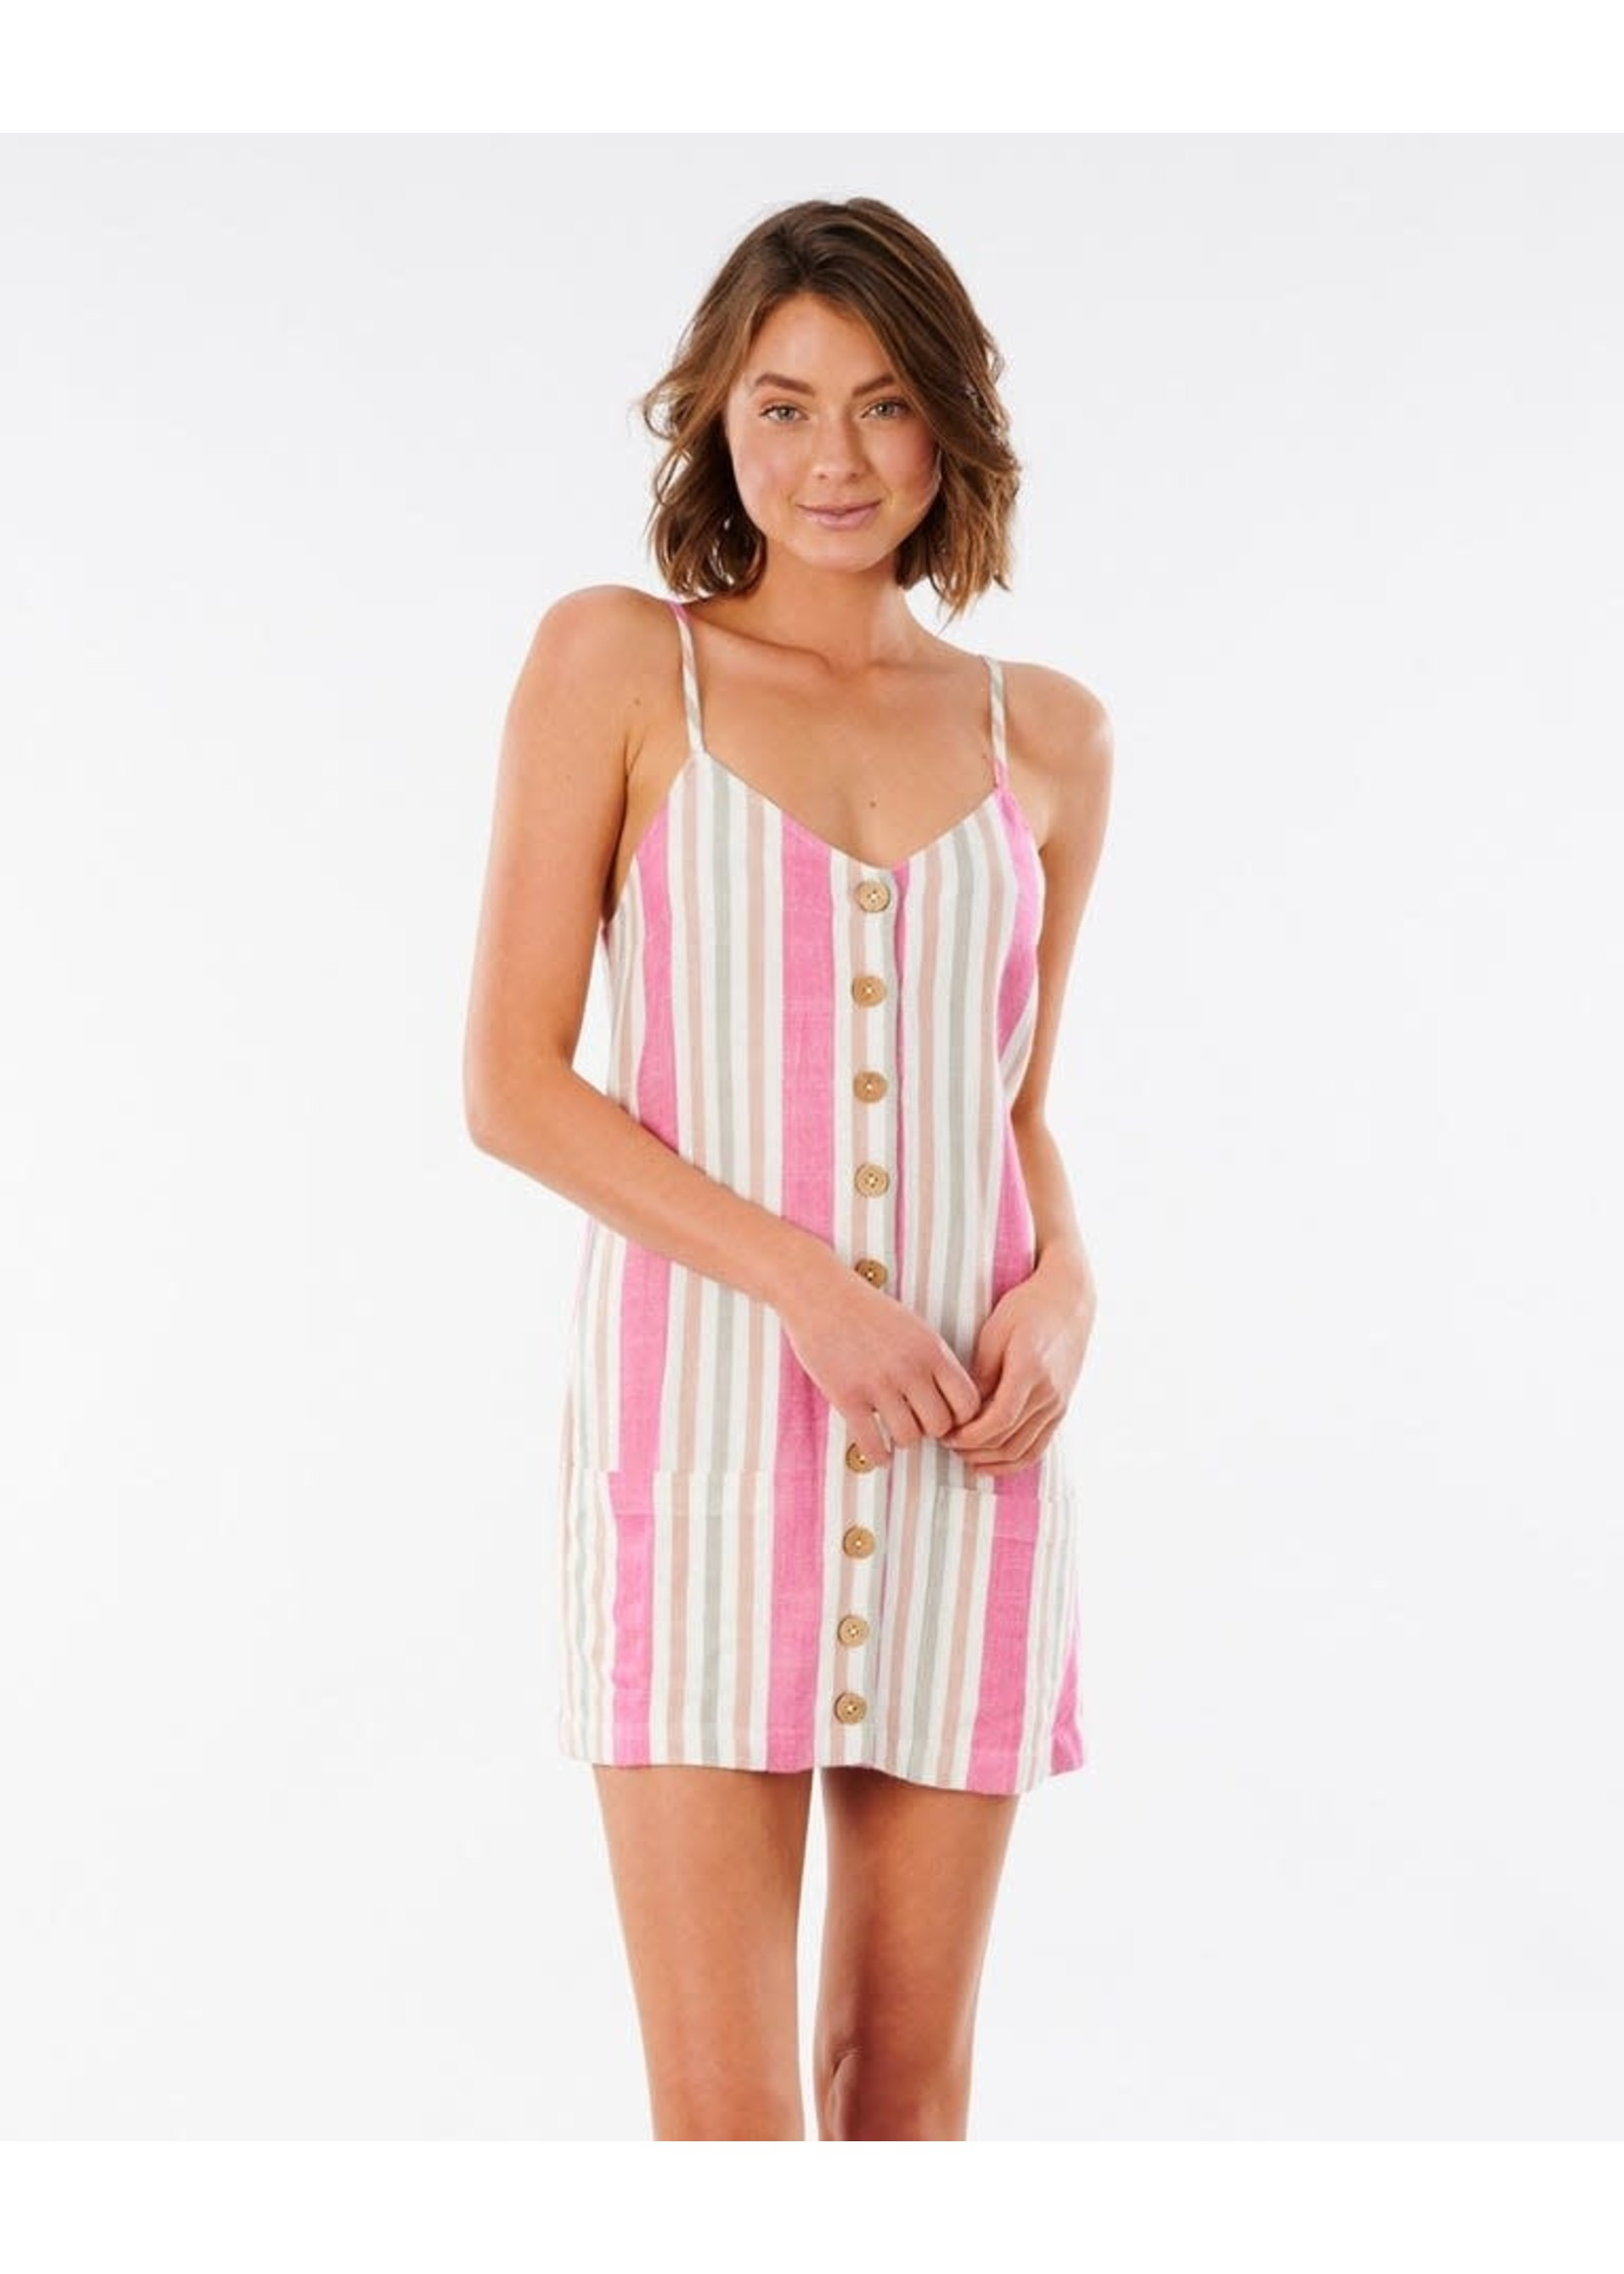 Ripcurl Rip Curl Ashore mini dress